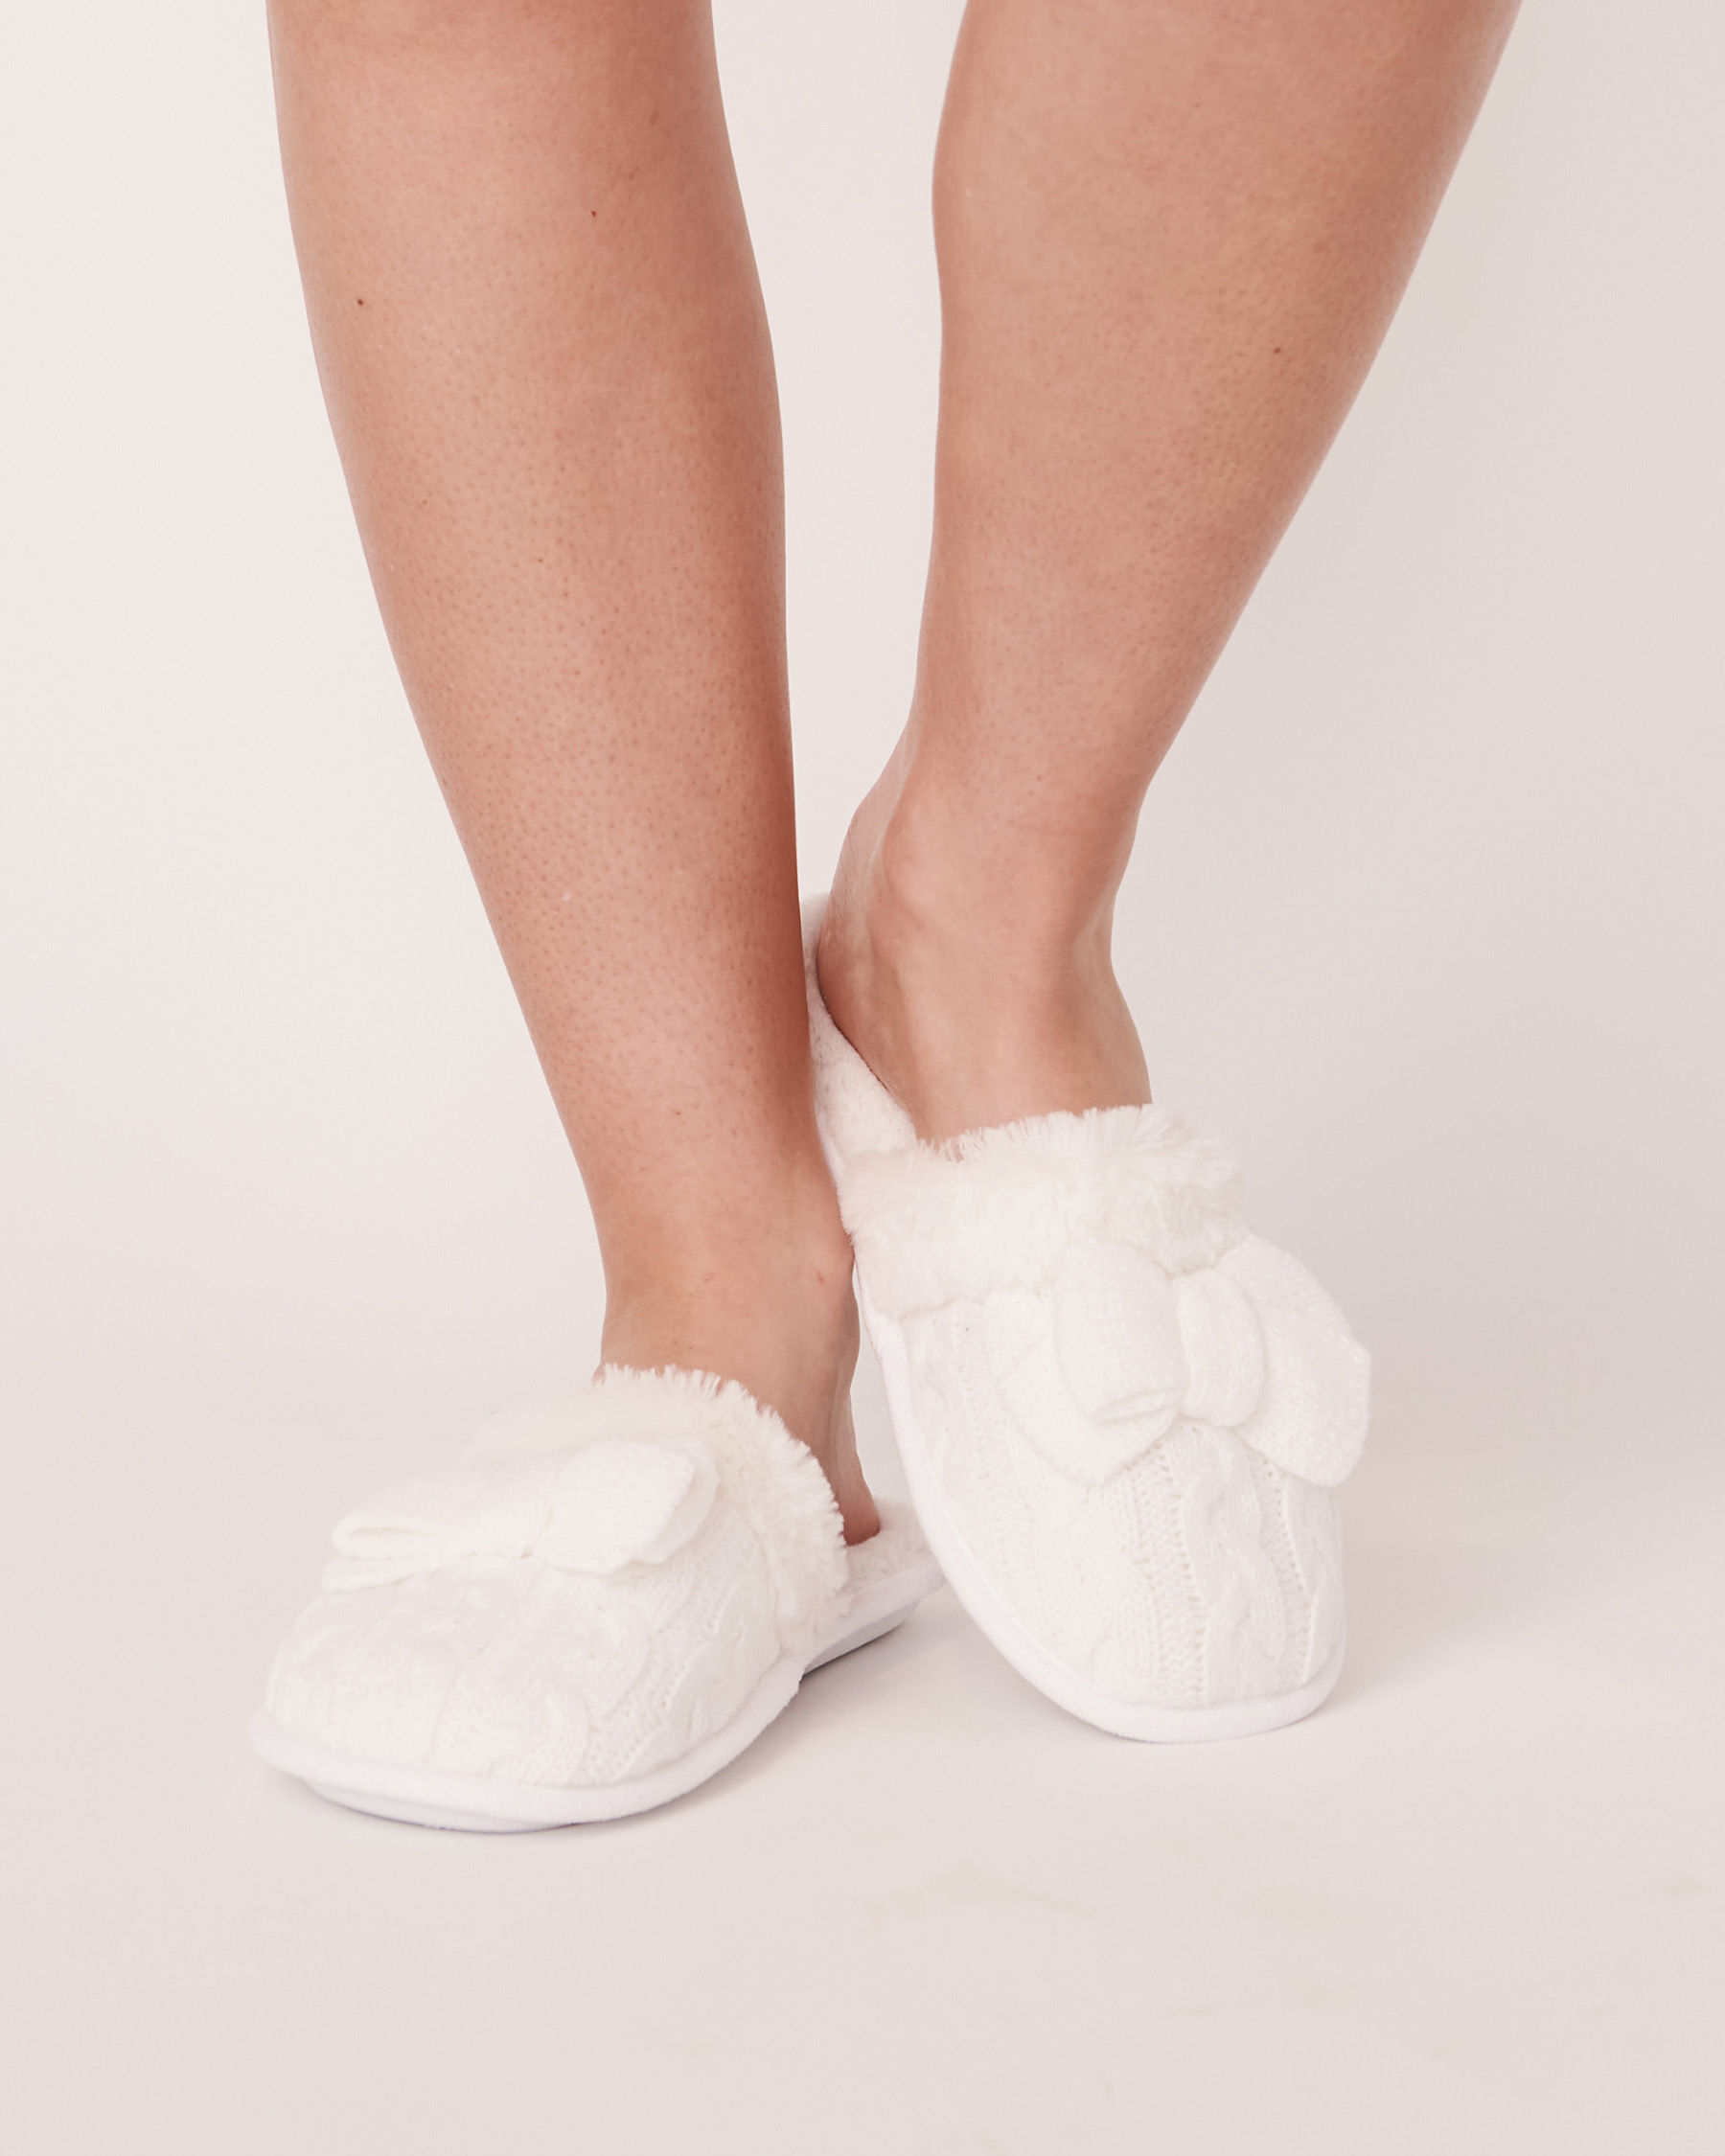 LA VIE EN ROSE Clog Slippers White 40700076 - View1